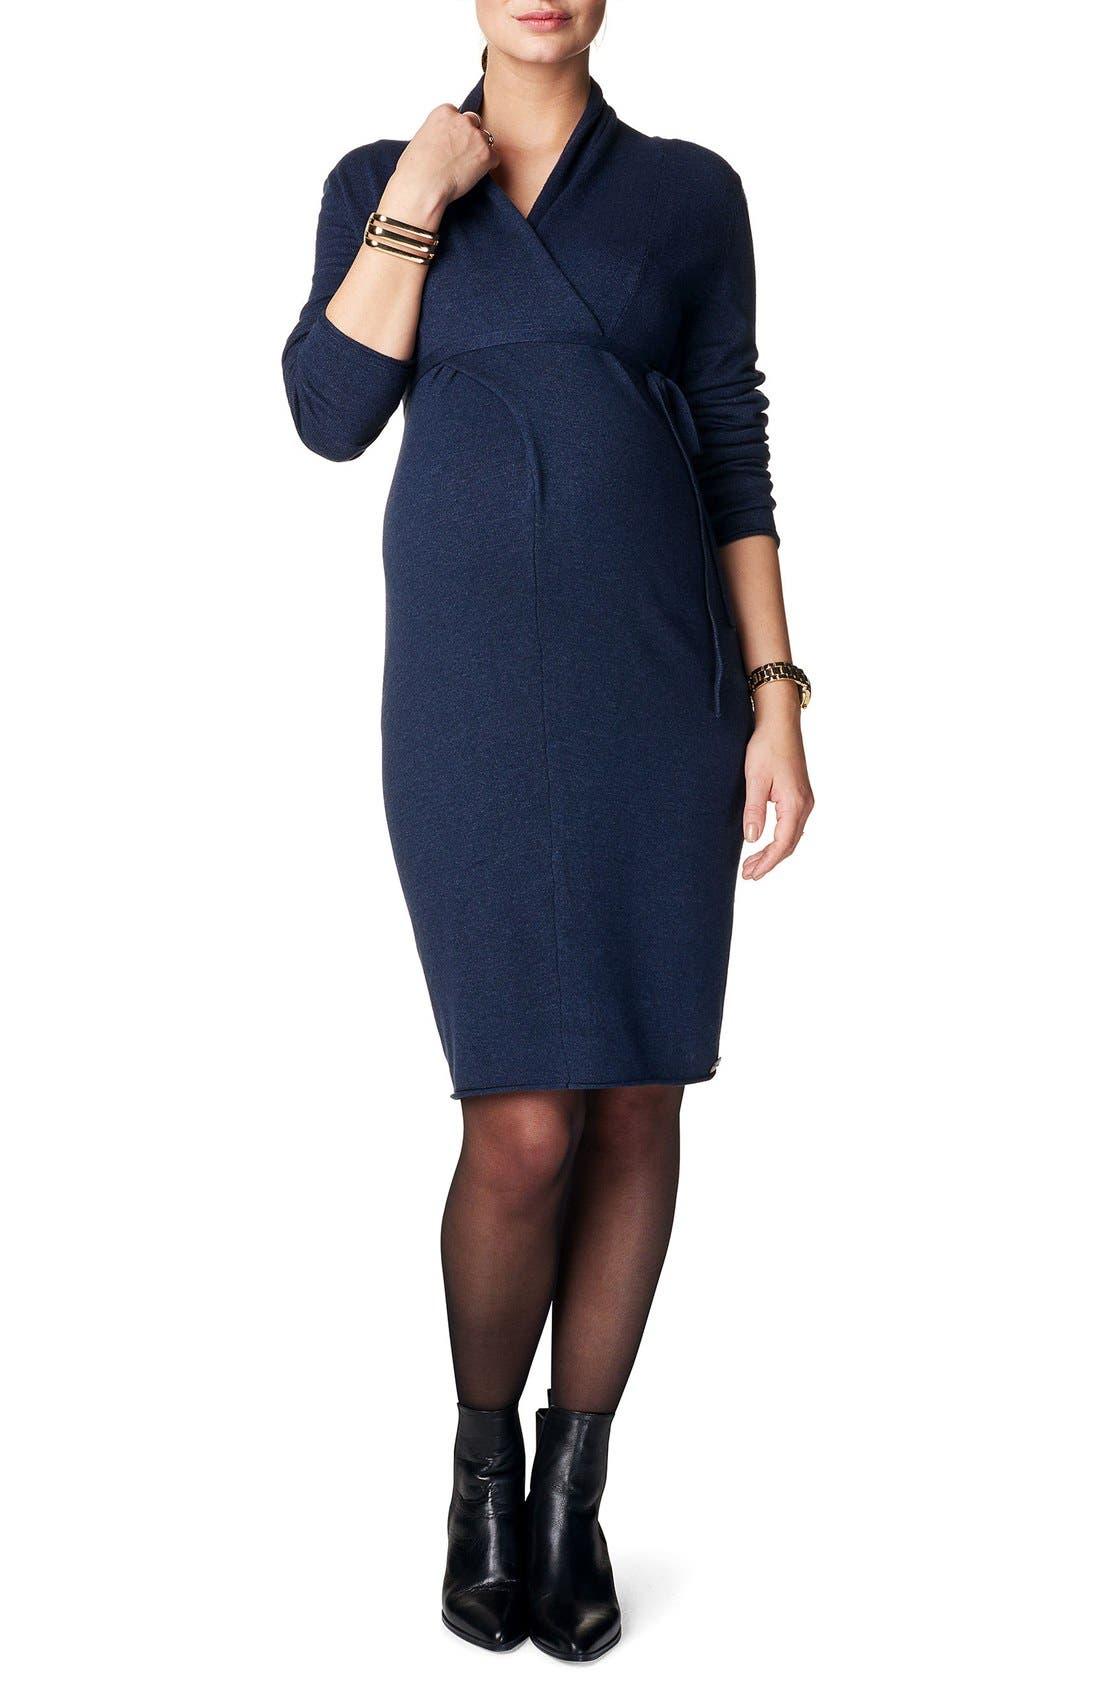 NOPPIES Zara Knit Maternity Sweater Dress, Main, color, 410